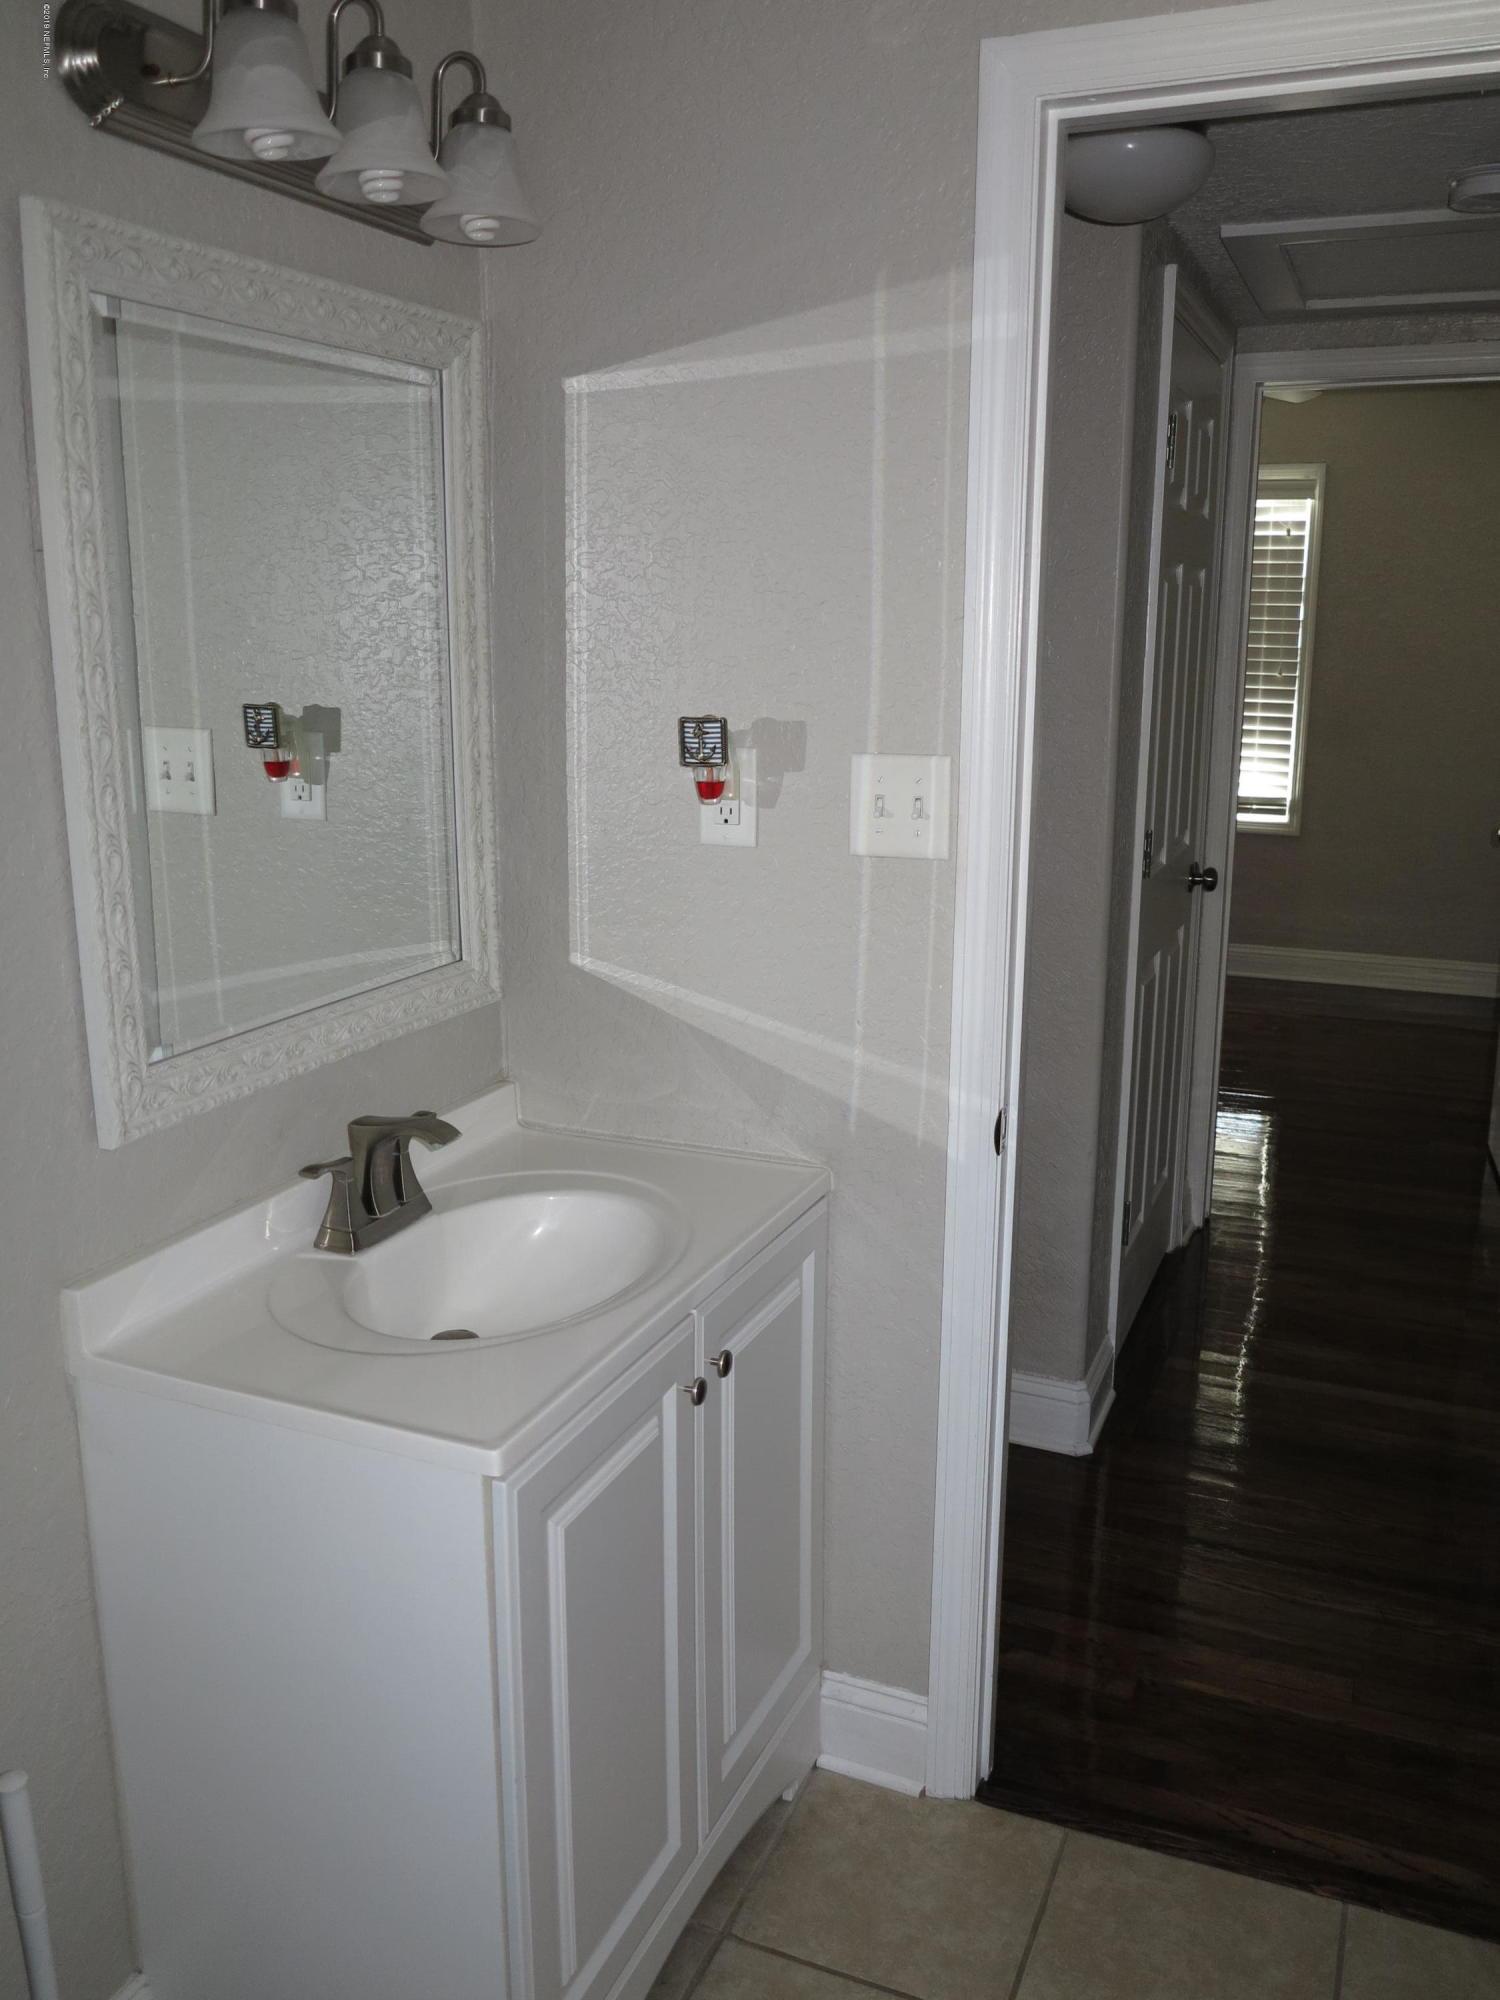 2131 INWOOD- JACKSONVILLE- FLORIDA 32207, 3 Bedrooms Bedrooms, ,1 BathroomBathrooms,Residential - single family,For sale,INWOOD,974989